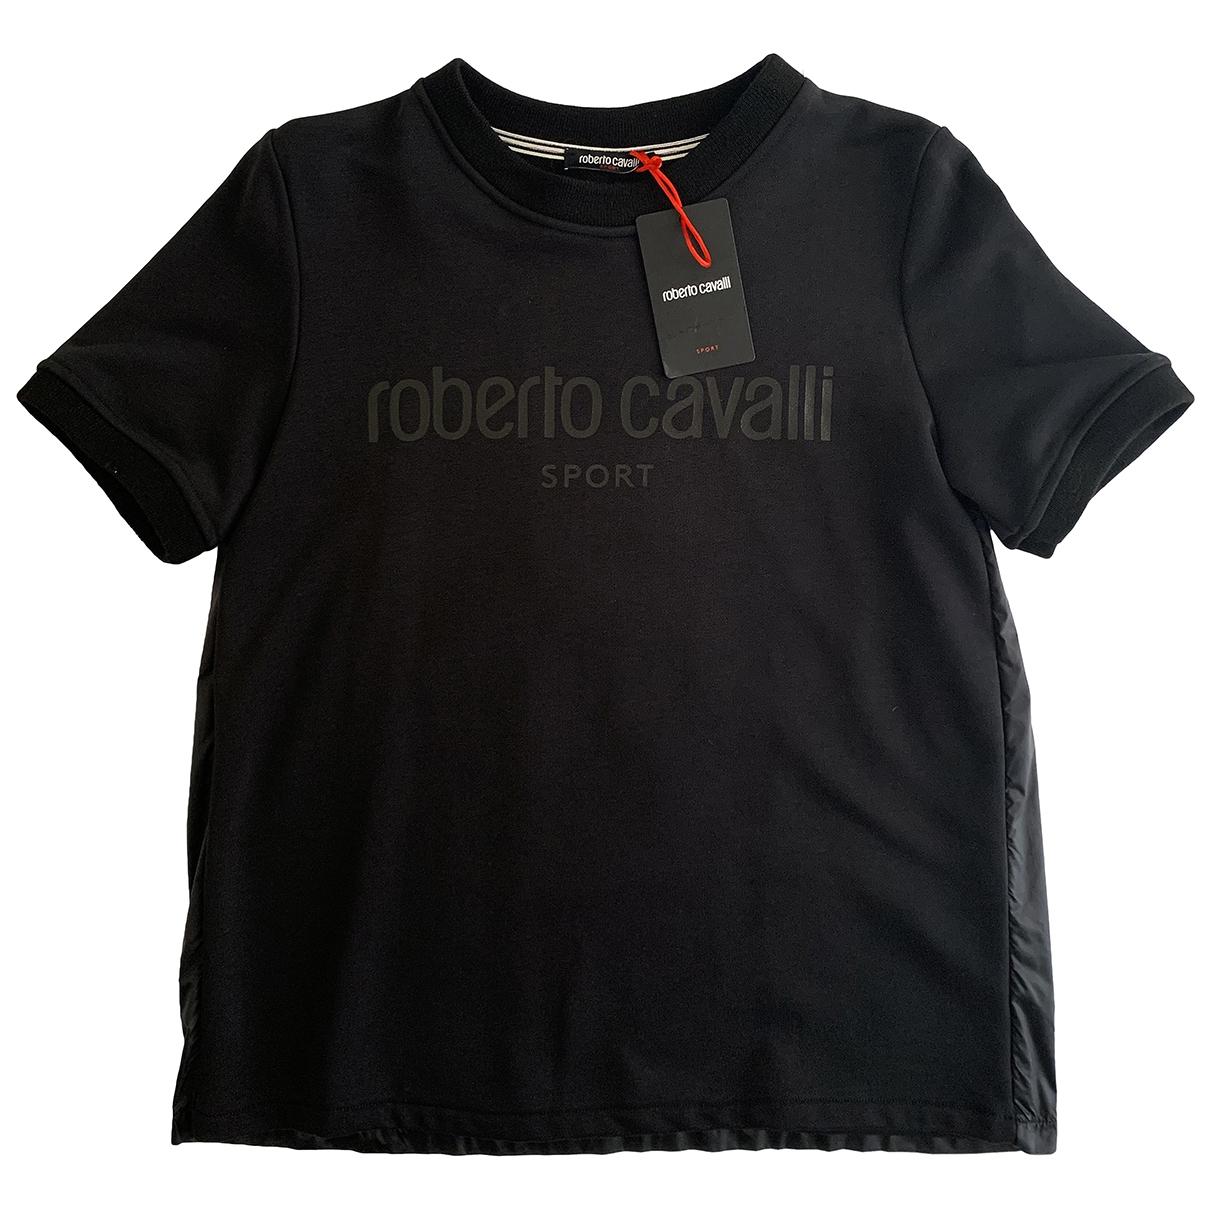 Roberto Cavalli \N Black Cotton  top for Women S International